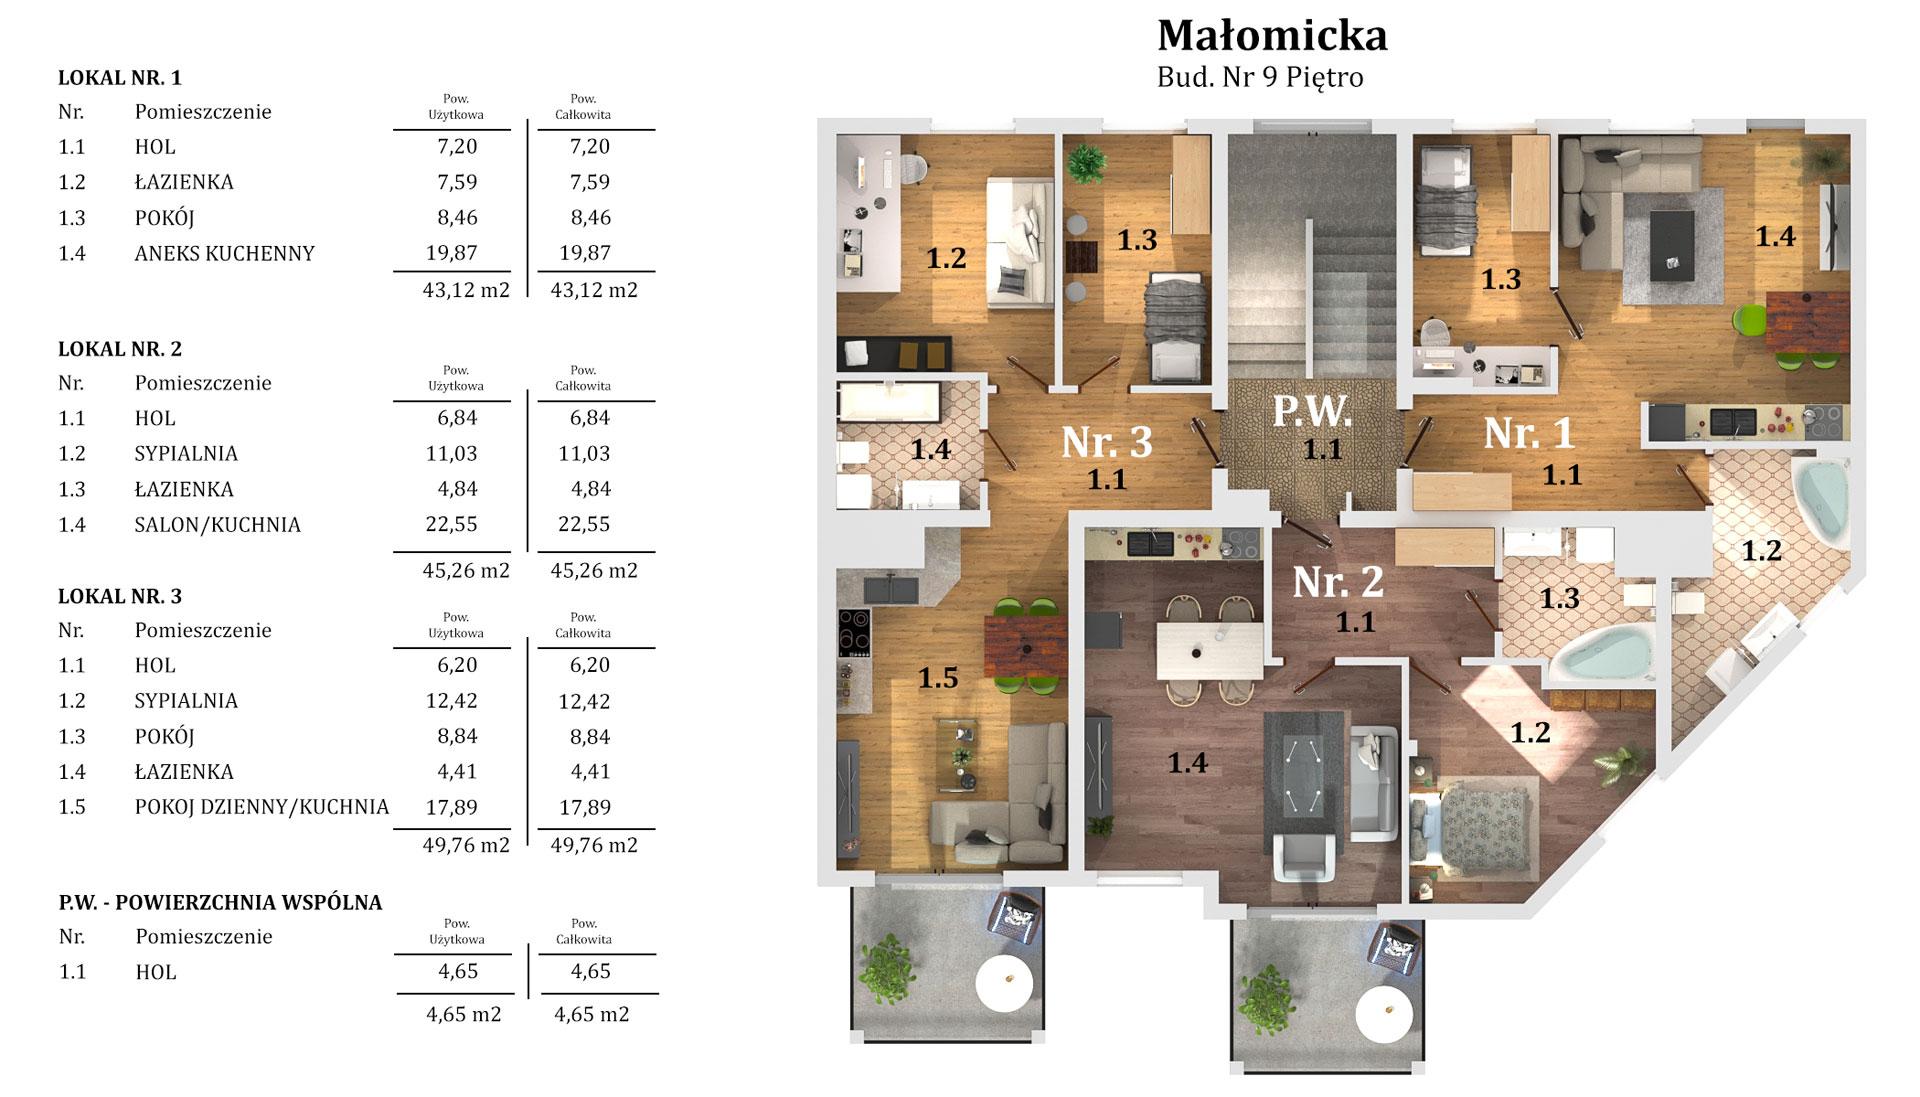 Blok Lubin Małomicka piętro